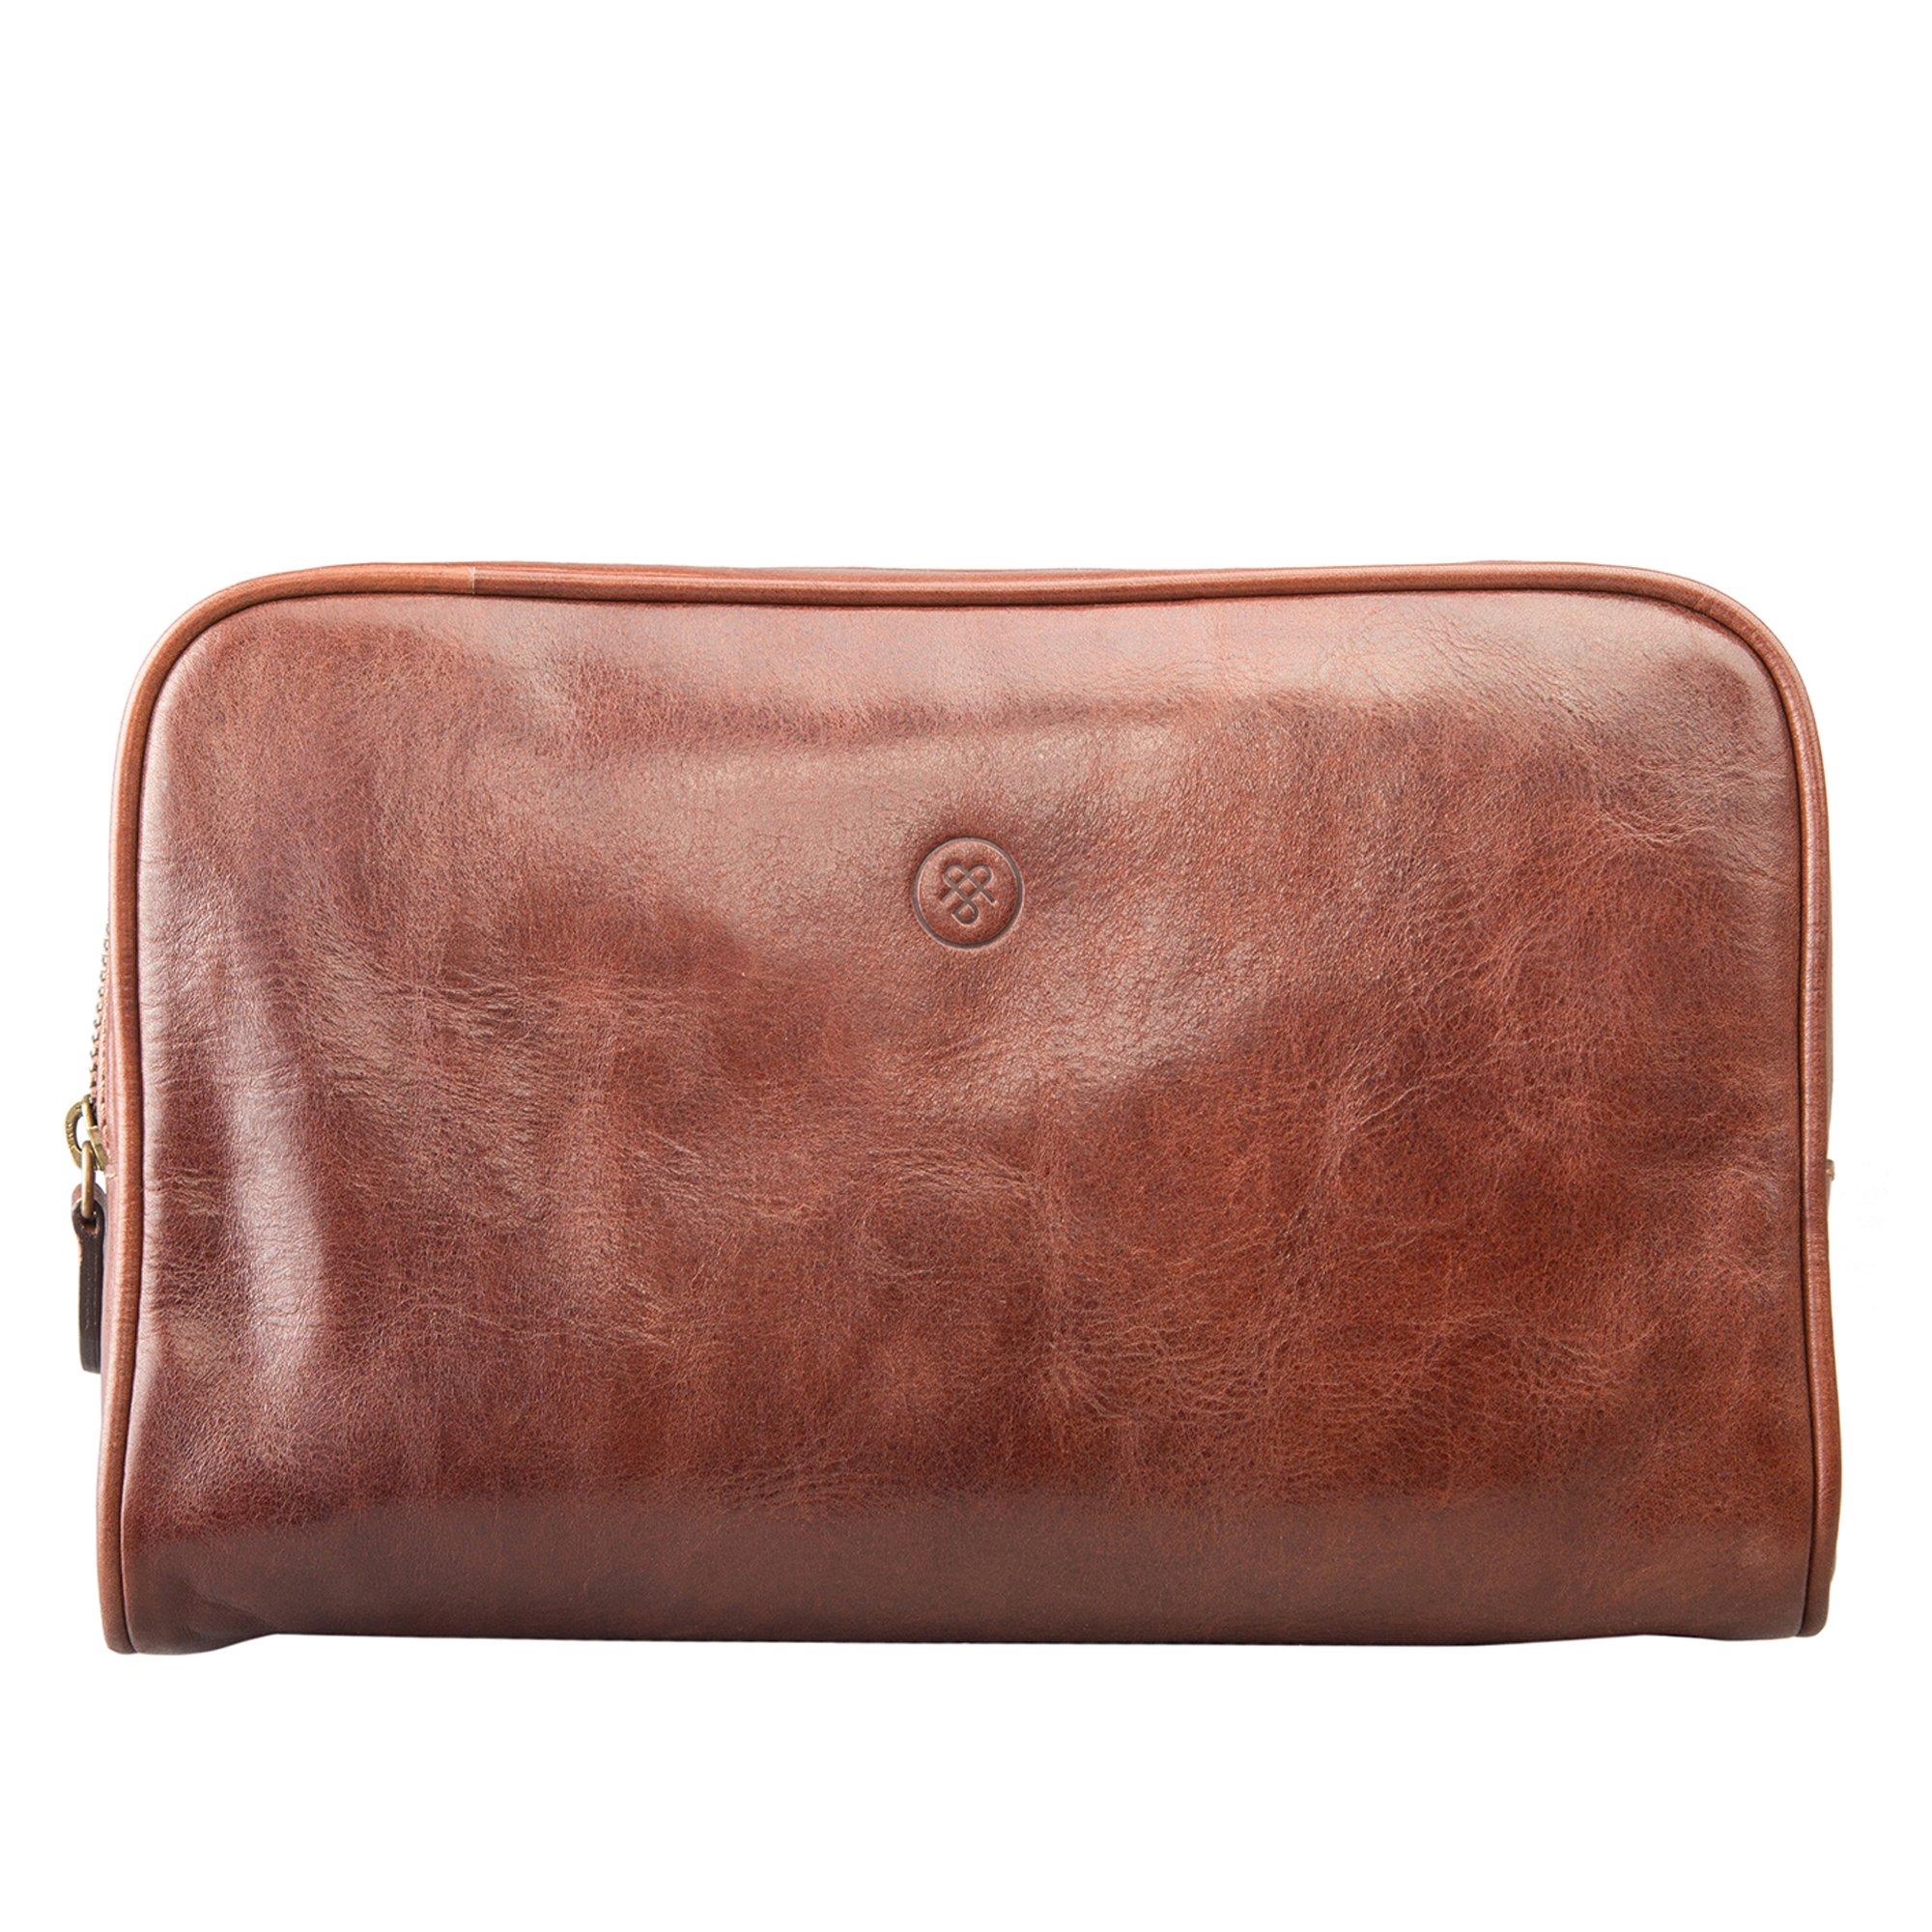 Maxwell Scott Luxury Italian Leather Washbag for Men (Raffaelle)